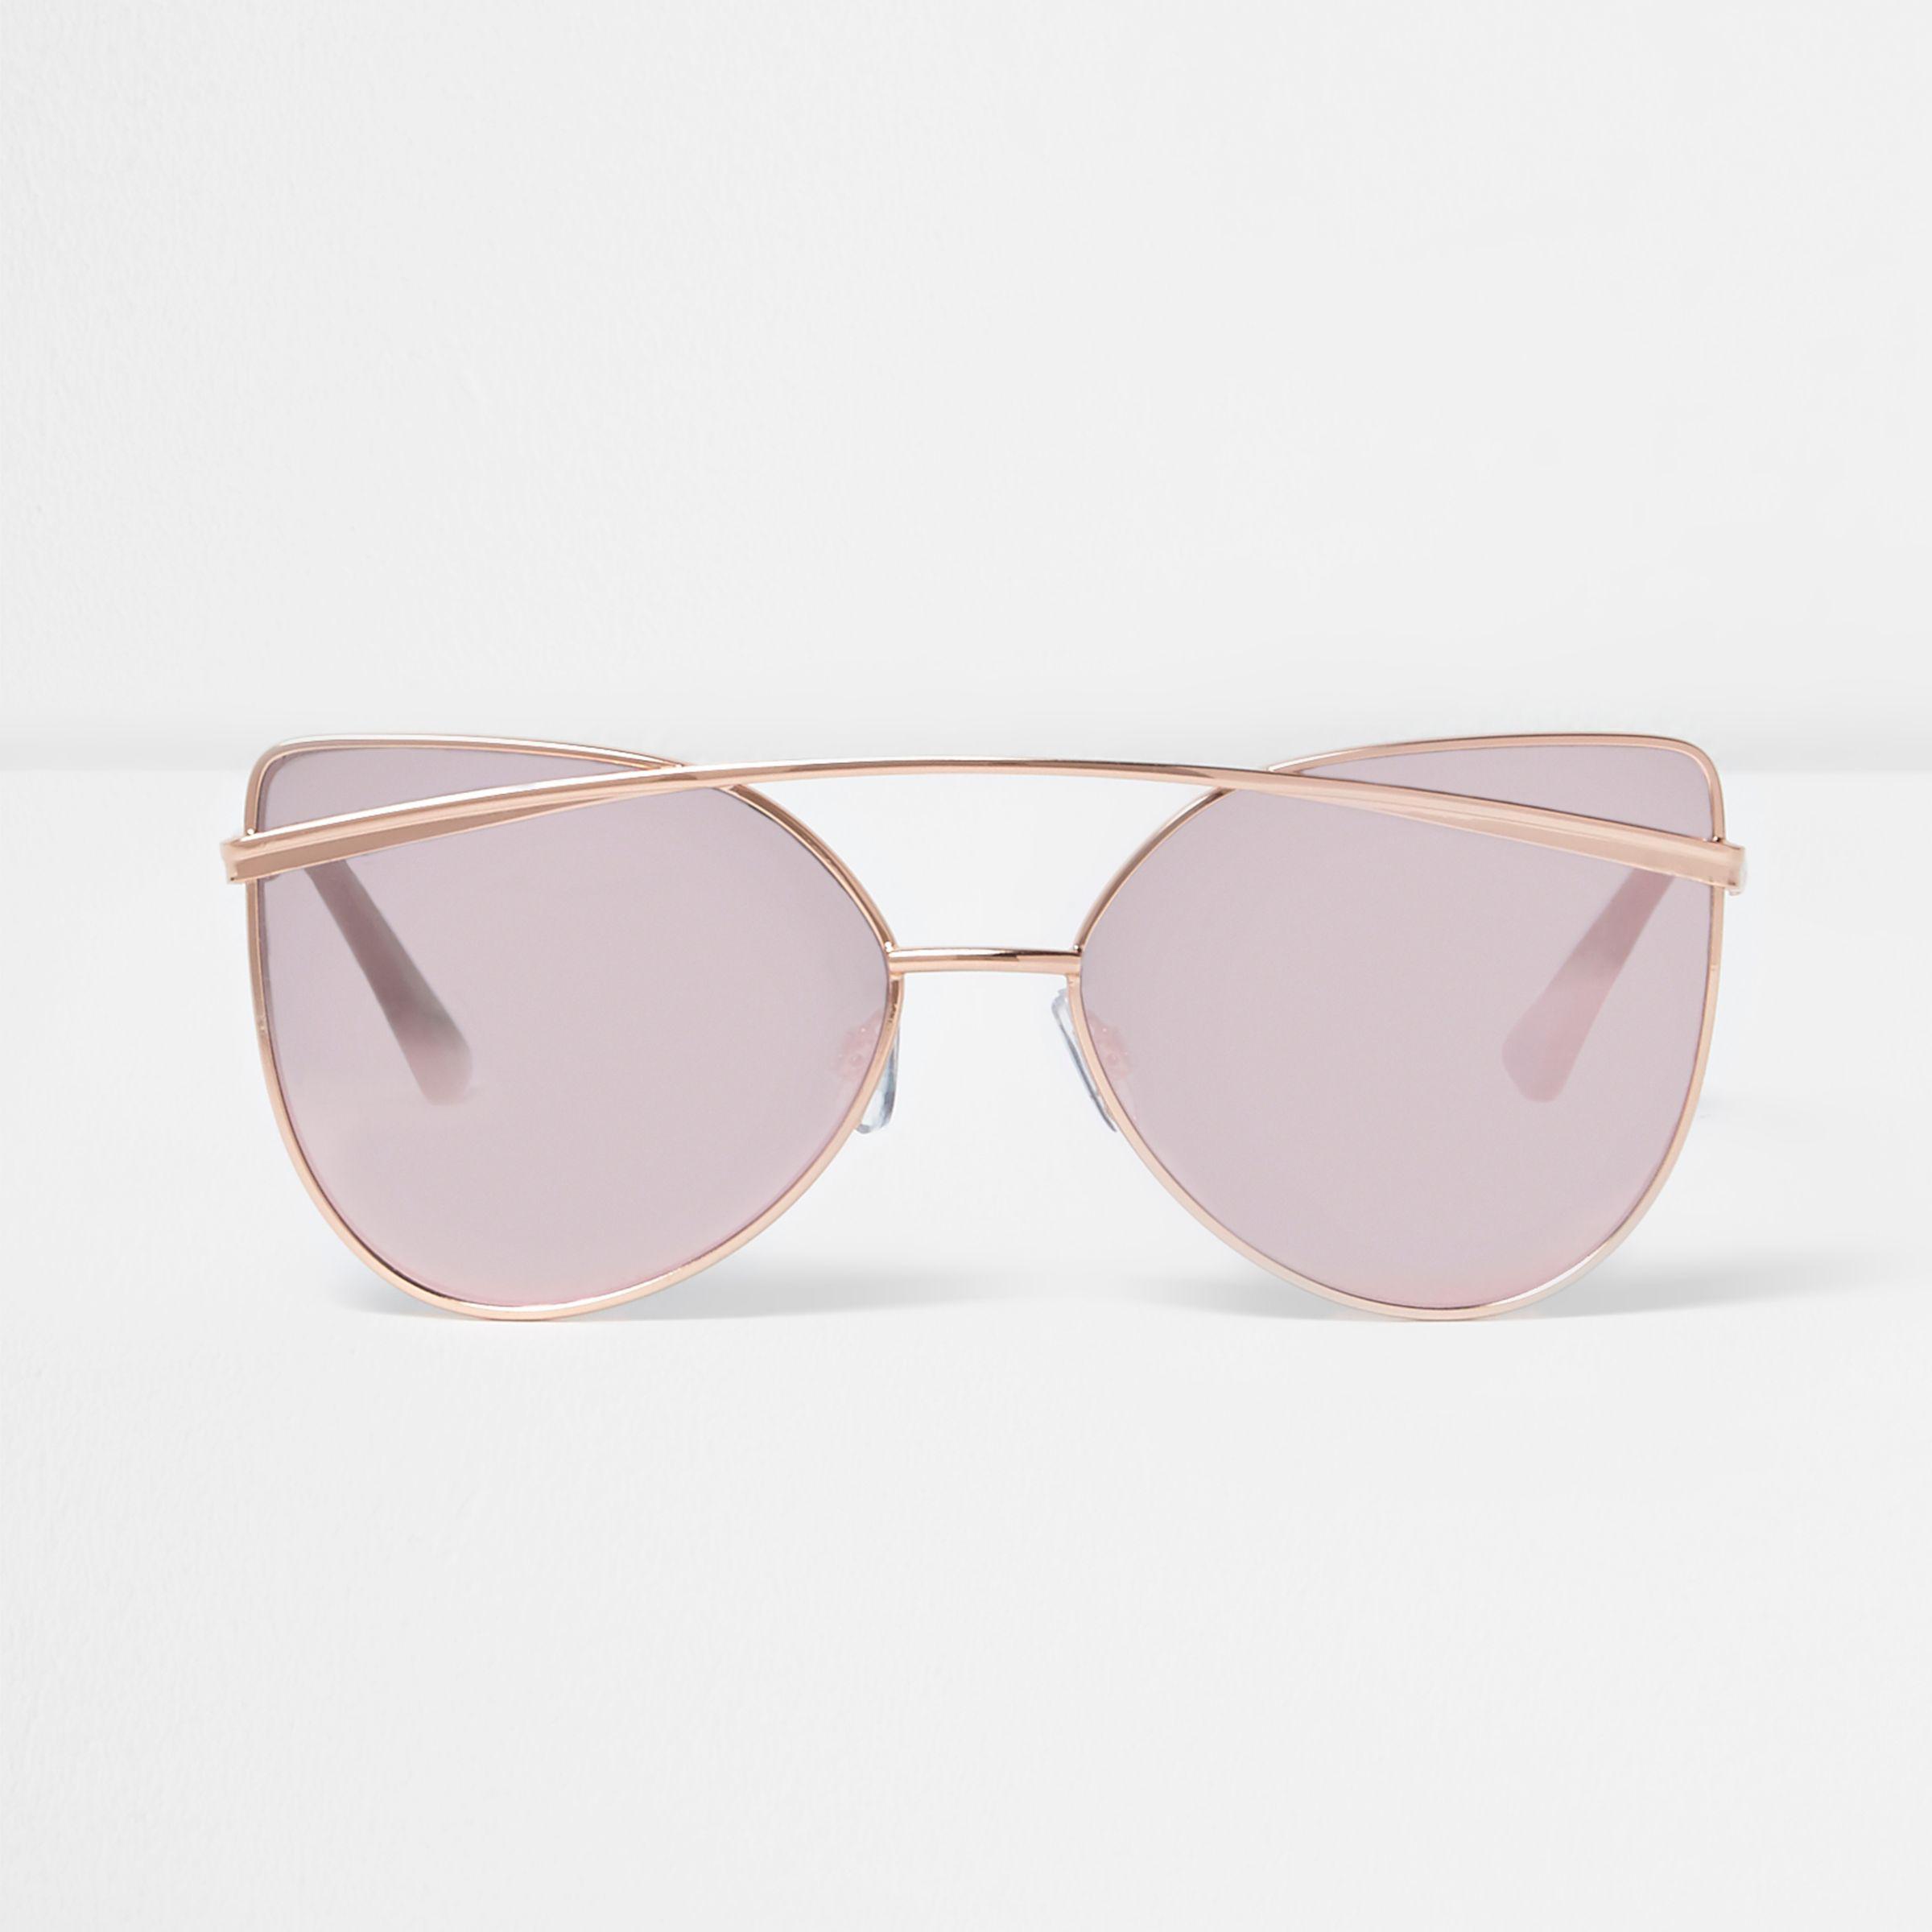 9df6470ceb5 River Island Rose Gold Tone Cat Eye Pink Mirror Sunglasses in Pink ...